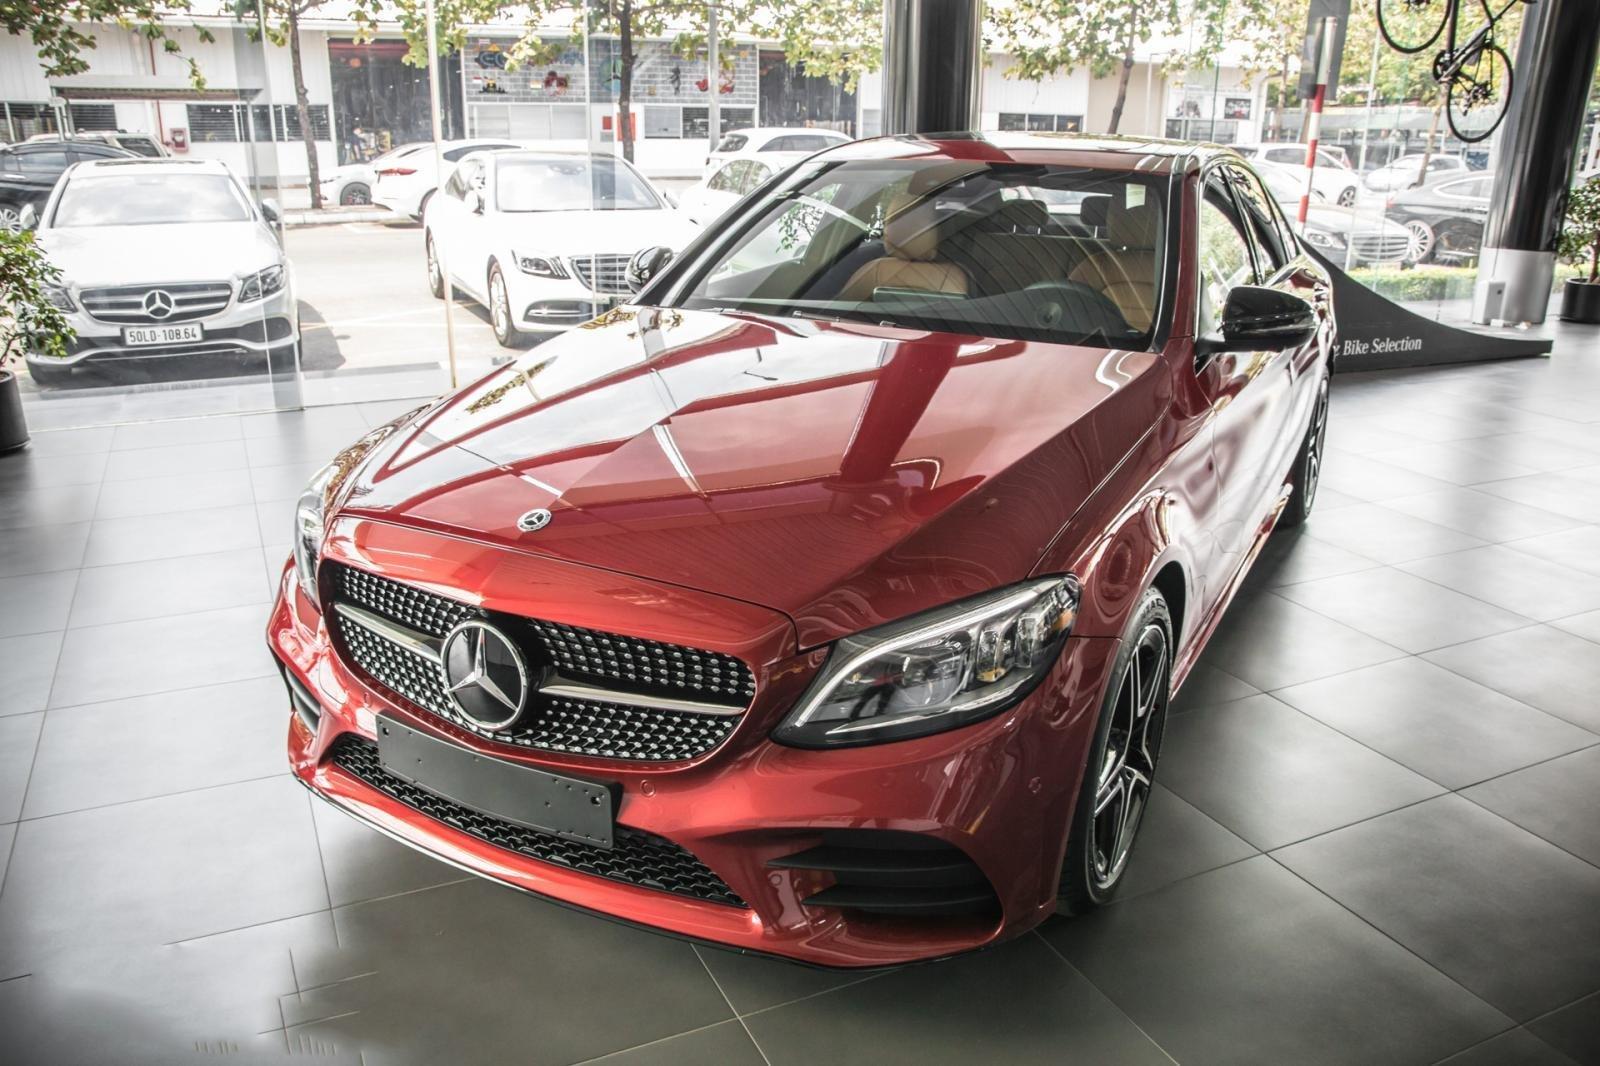 Thông số kỹ thuật xe Mercedes-Benz C300 2020